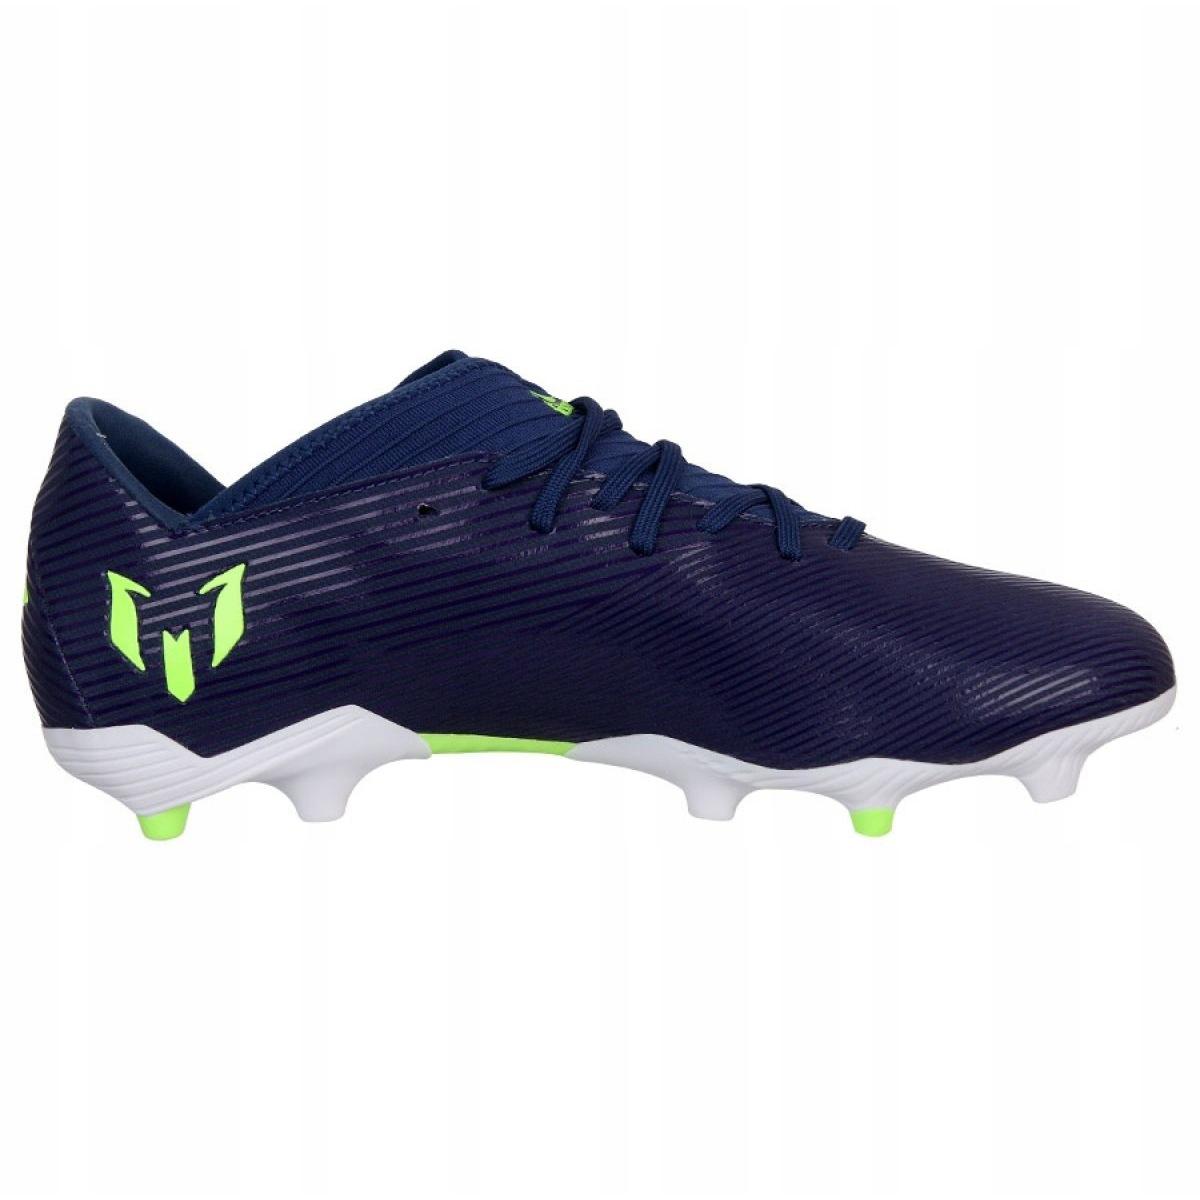 Chaussure de Football adidas Nemeziz Messi 17.3 FG Bleu Junior